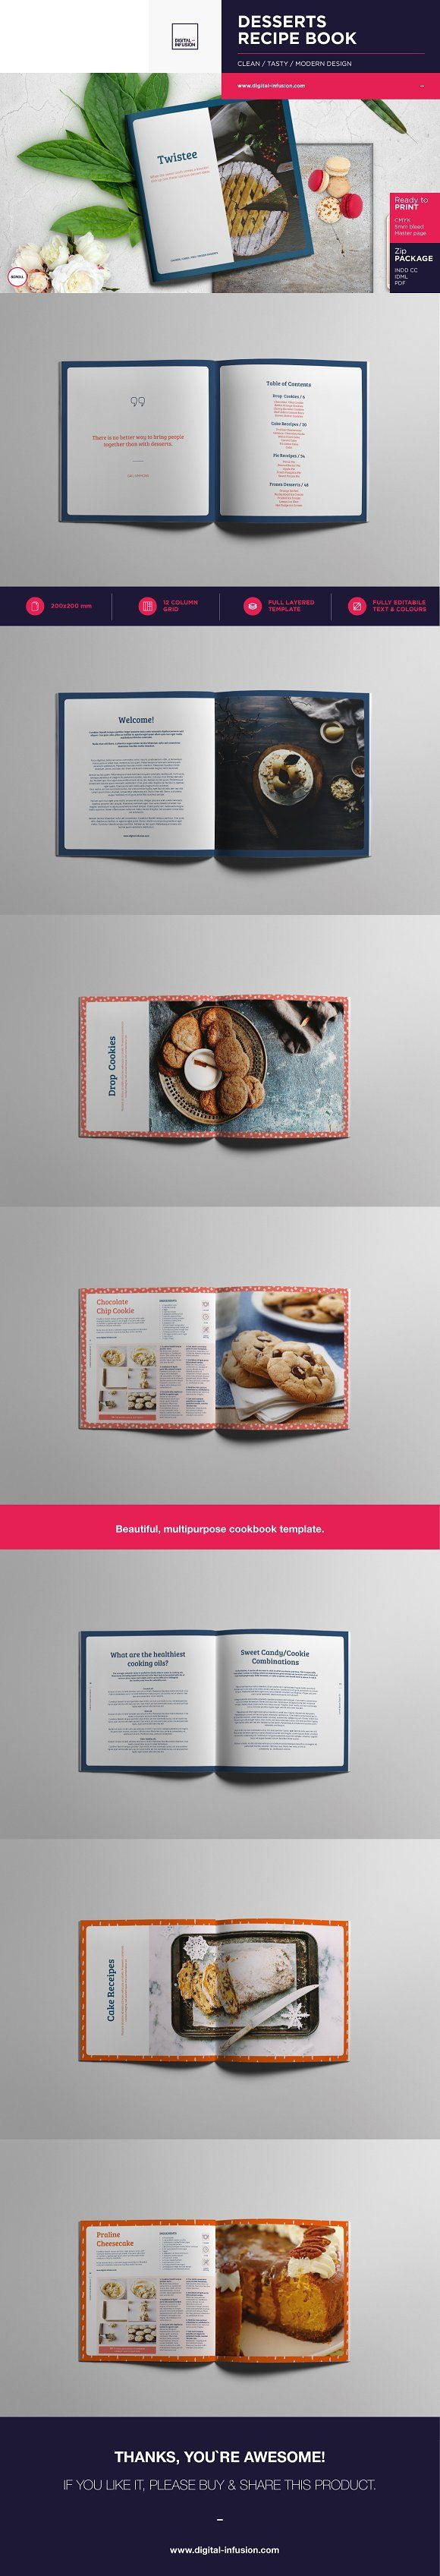 12 best ksia a ka kucharska elegancki images on pinterest cookbook